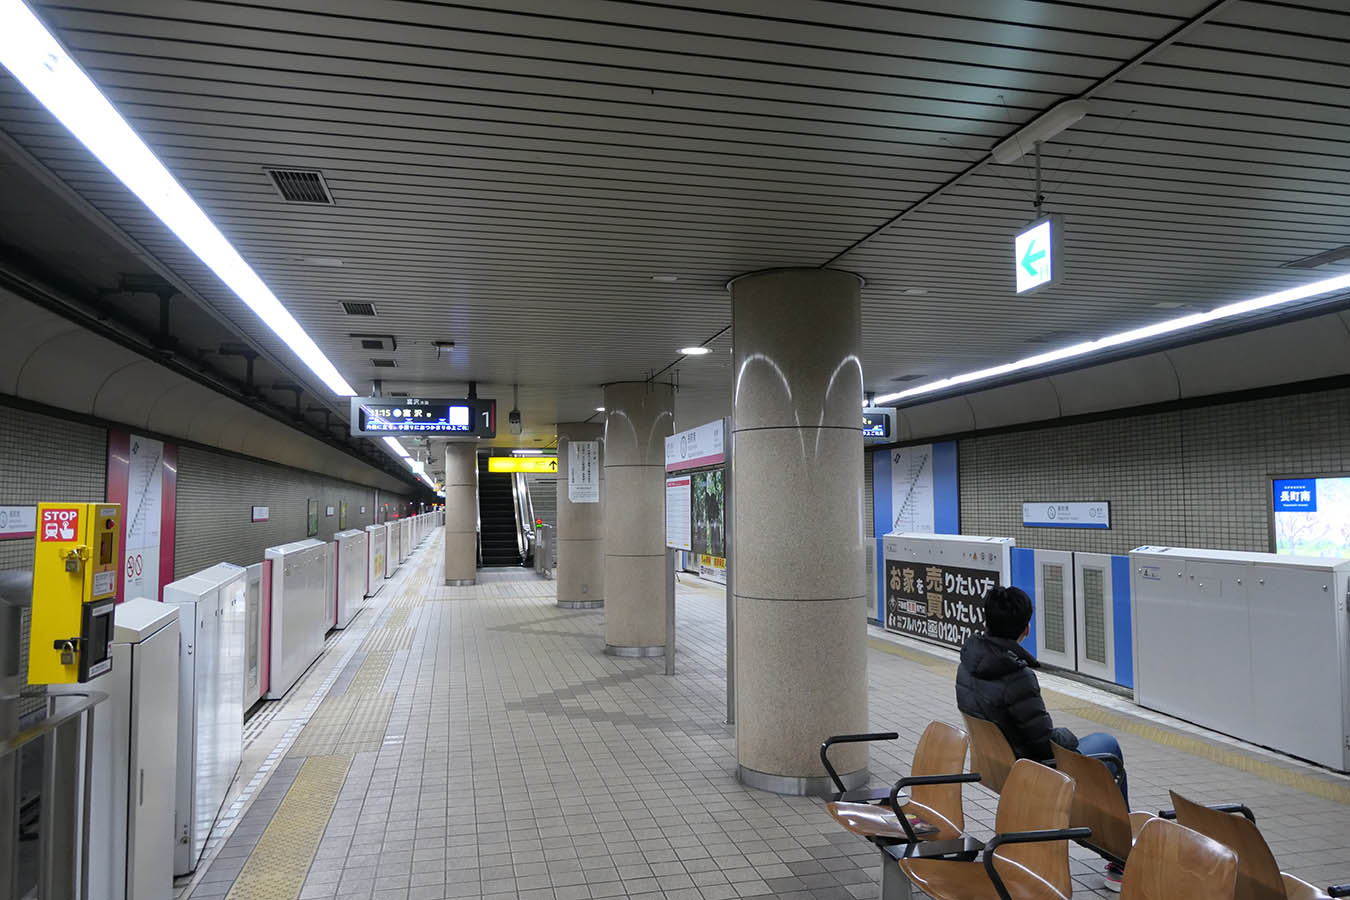 SS-N16_photo02.jpg